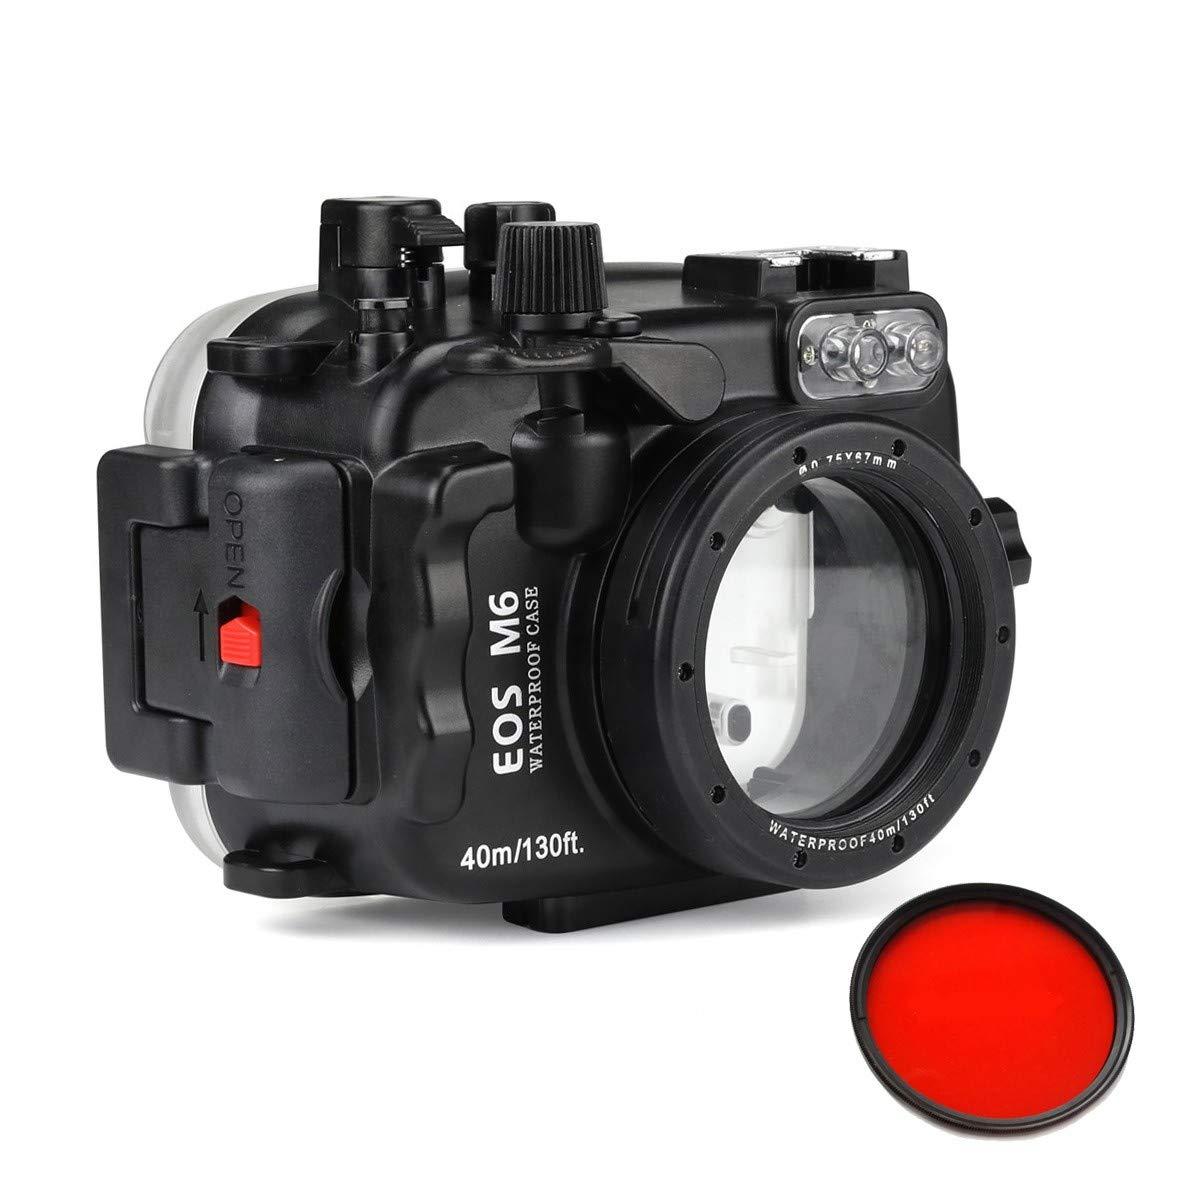 Sea Frogs 40m/ 130ft 防水カメラバッグケース/水中カメラハウジング Canon EOS M6(22mm)の用   B07QK3GCPG